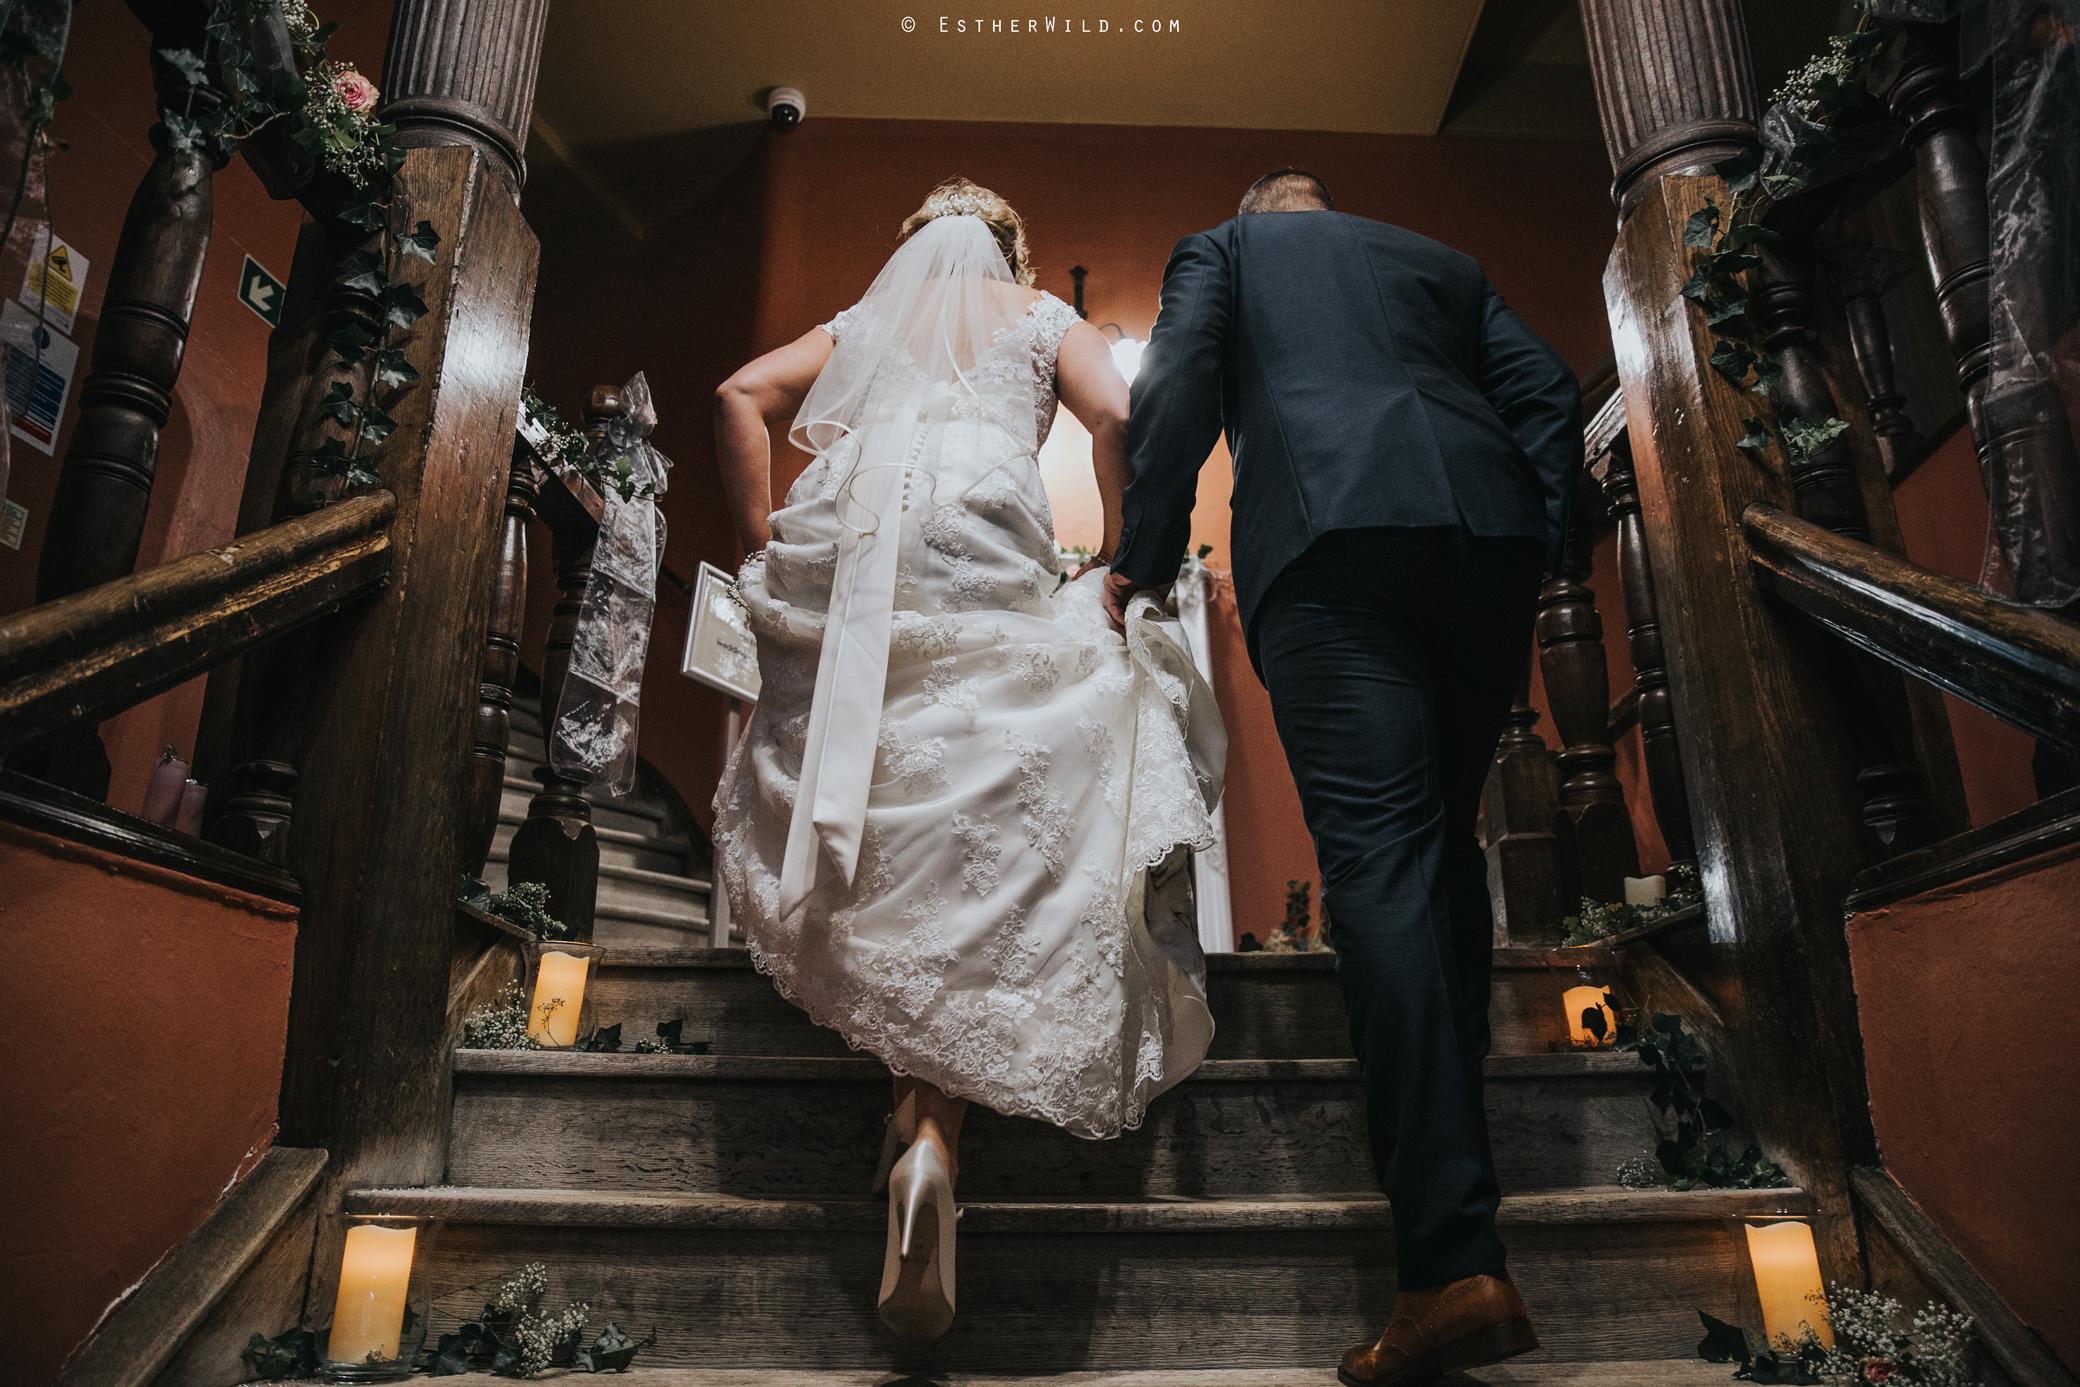 Wedding_Kings_Lynn_Town_Hall_Norfolk_Photographer_Esther_Wild_IMG_1363.jpg